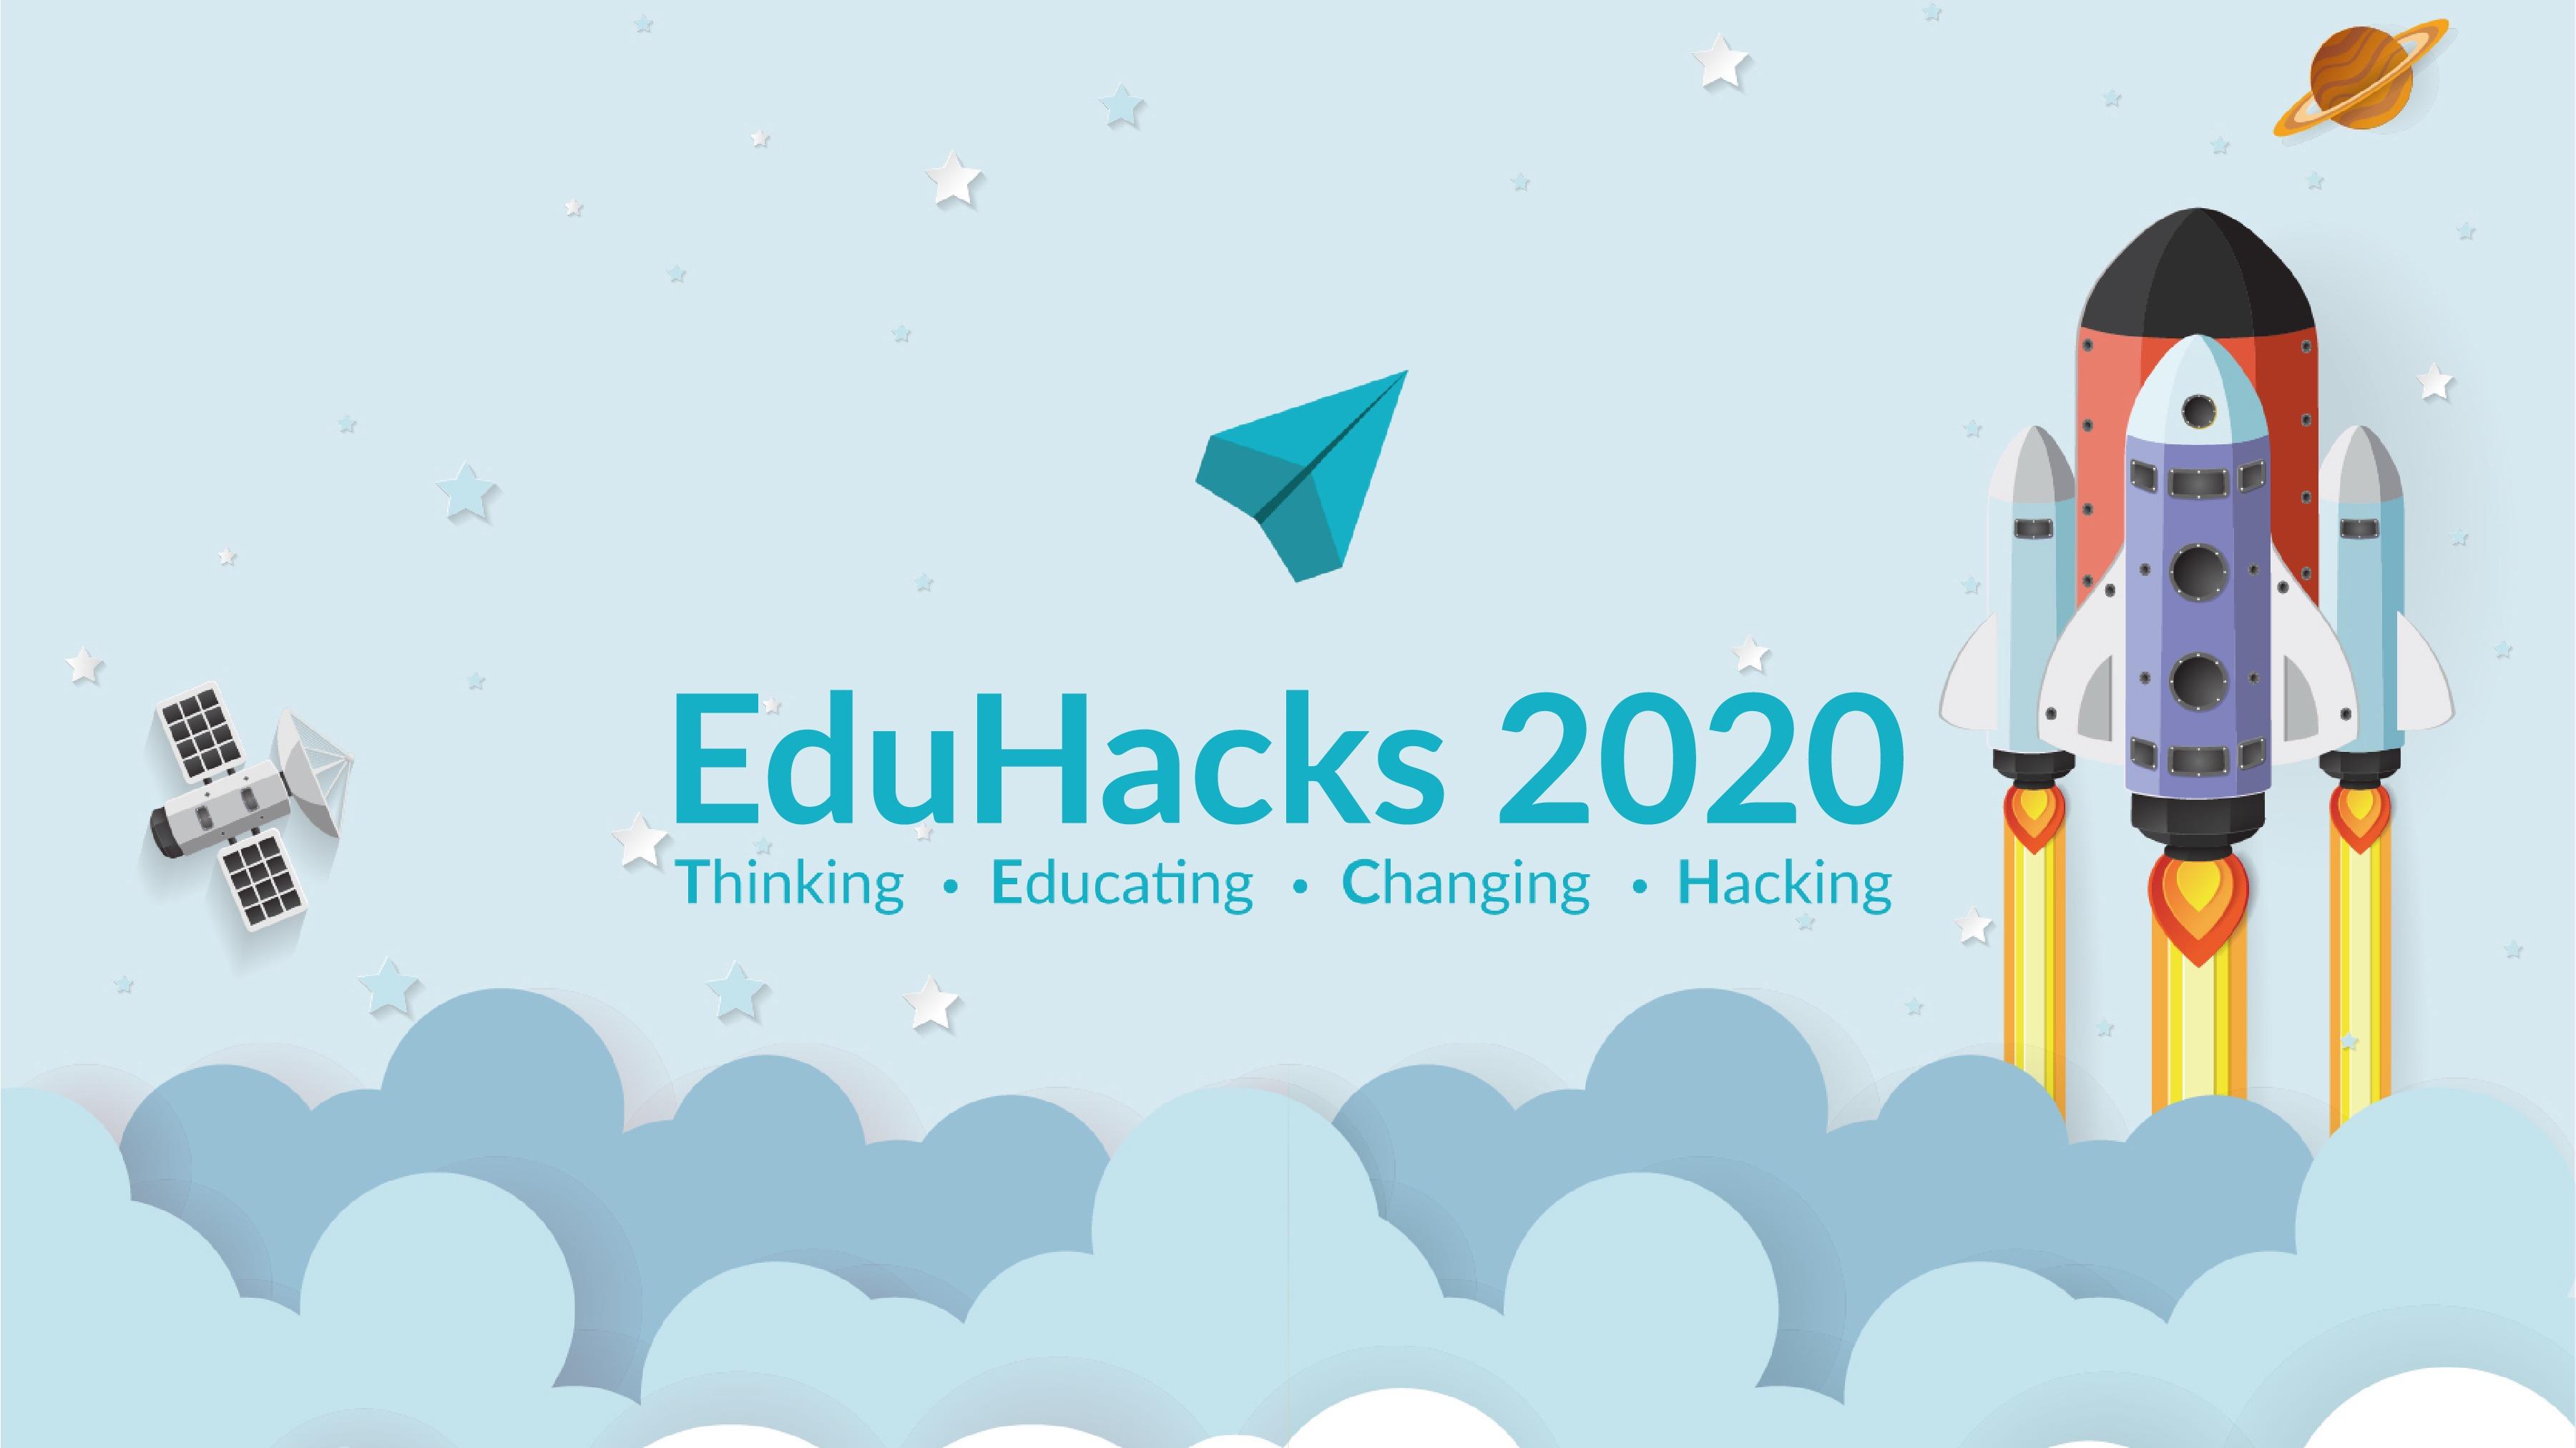 EduHacks 2020